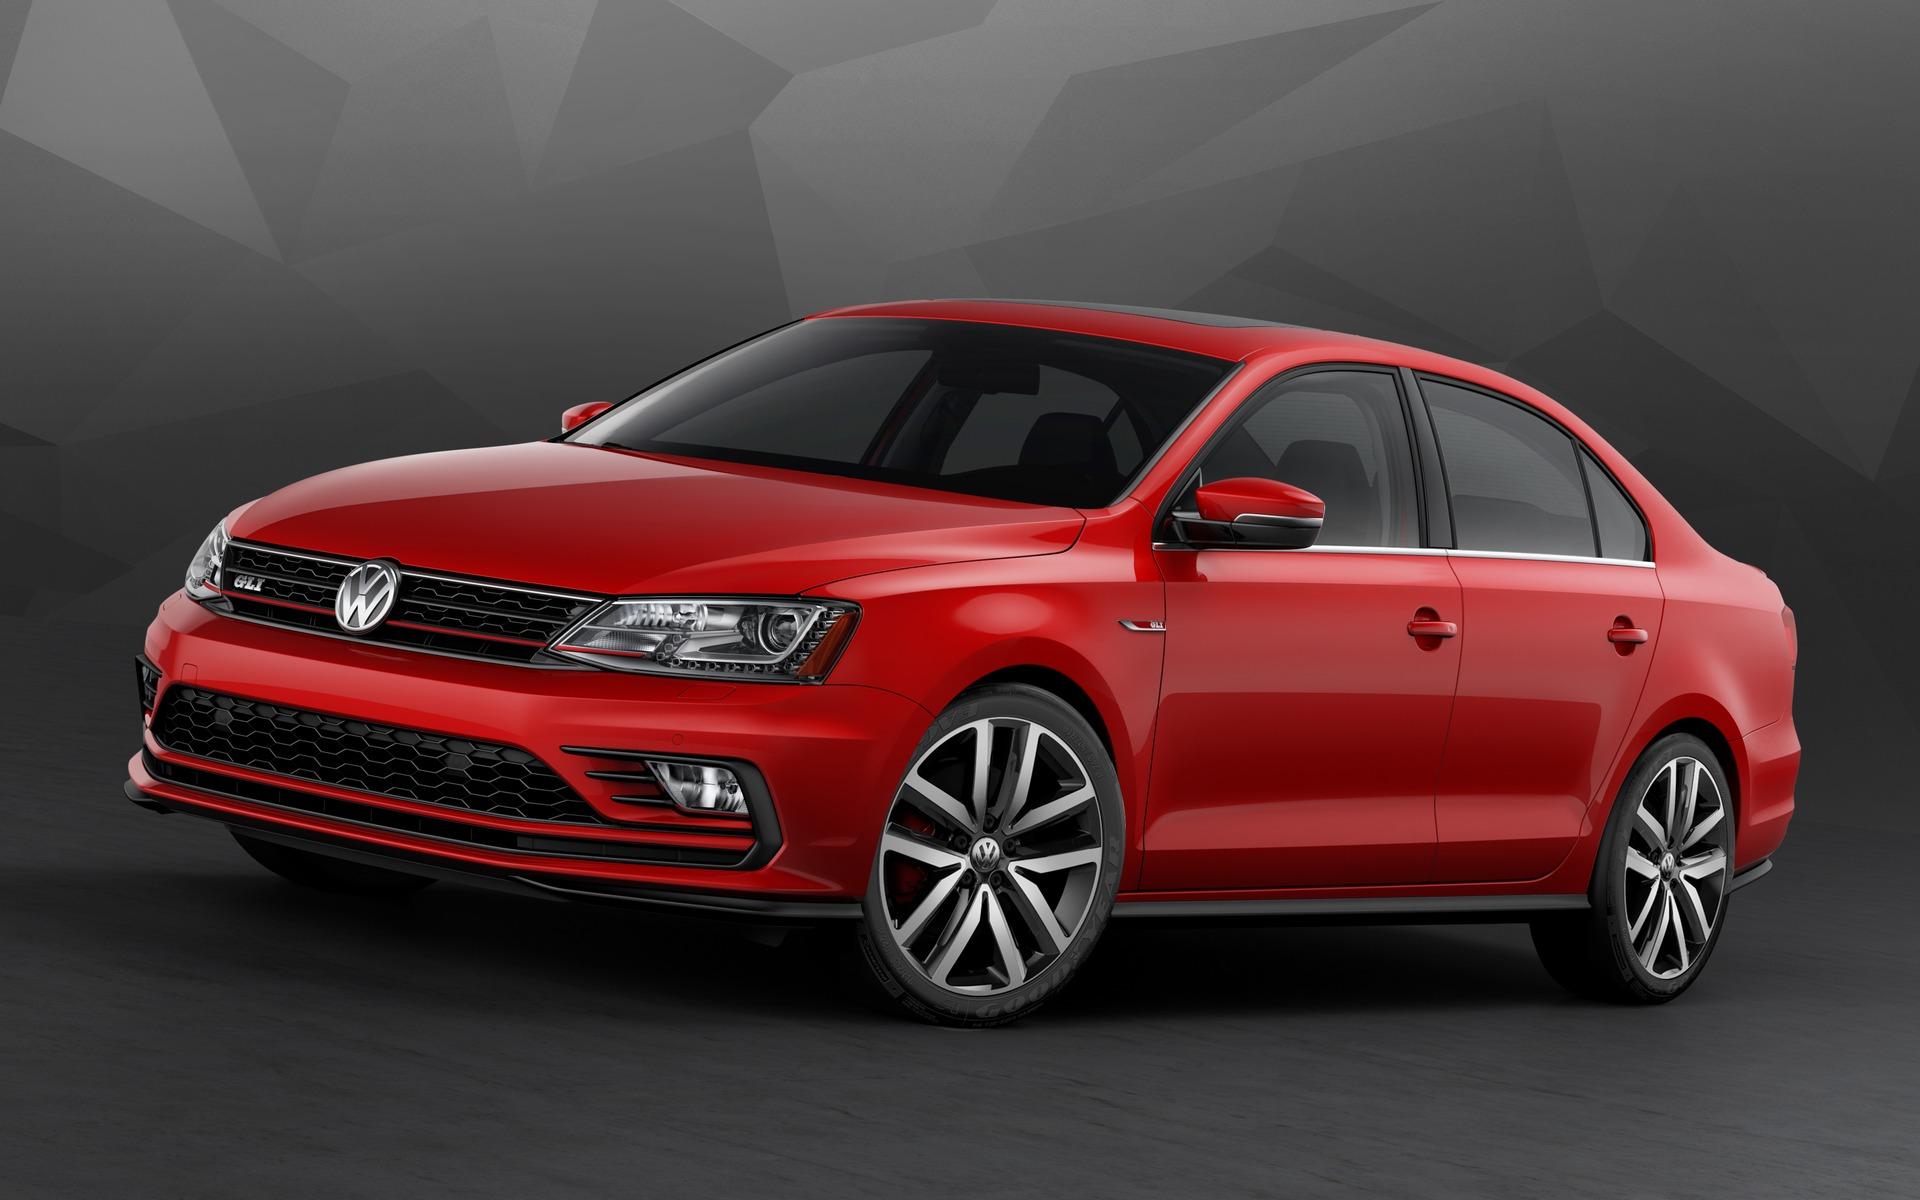 <p>Volkswagen Jetta<br>Generation #6 (2011-2018)</p>